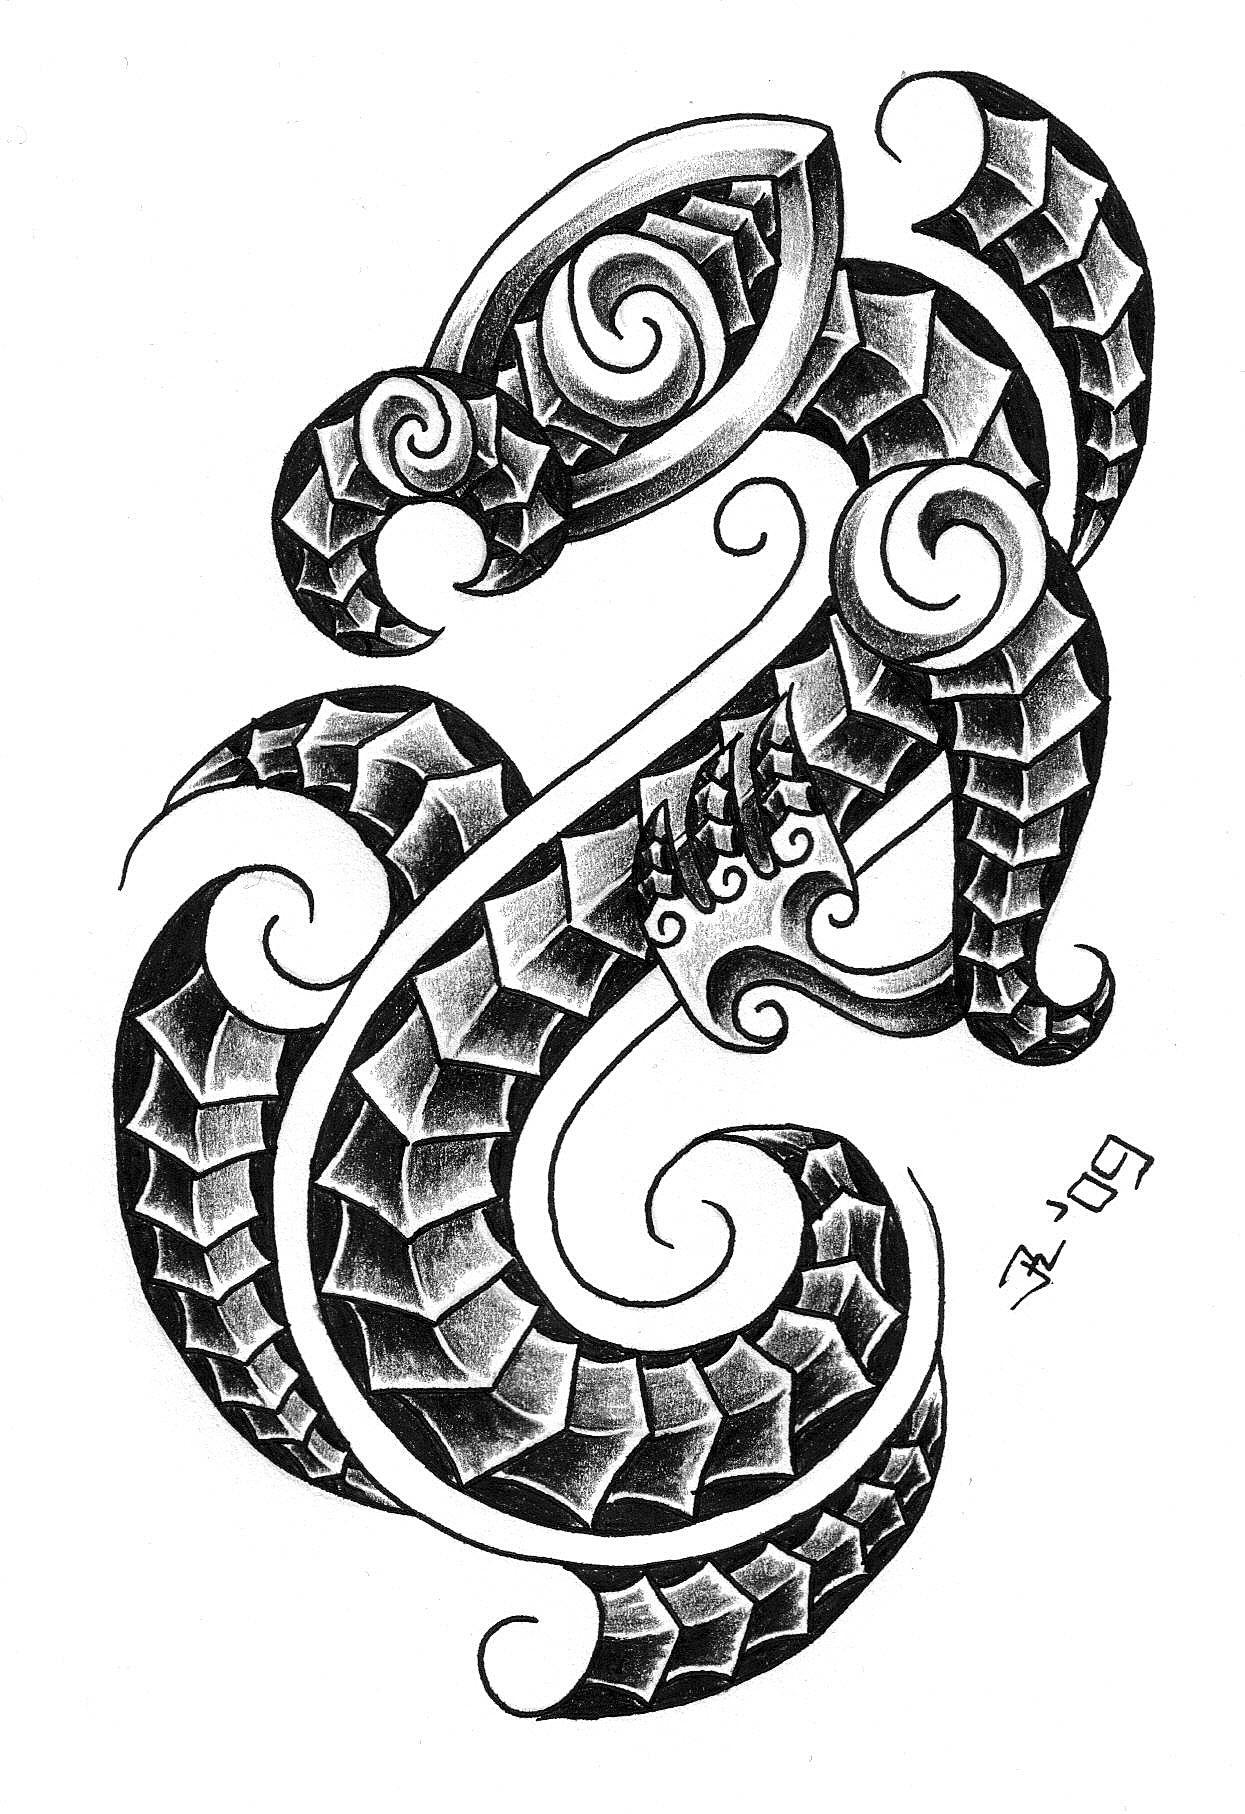 maori tattoo bedeutung symbole maori tattoo bedeutung. Black Bedroom Furniture Sets. Home Design Ideas